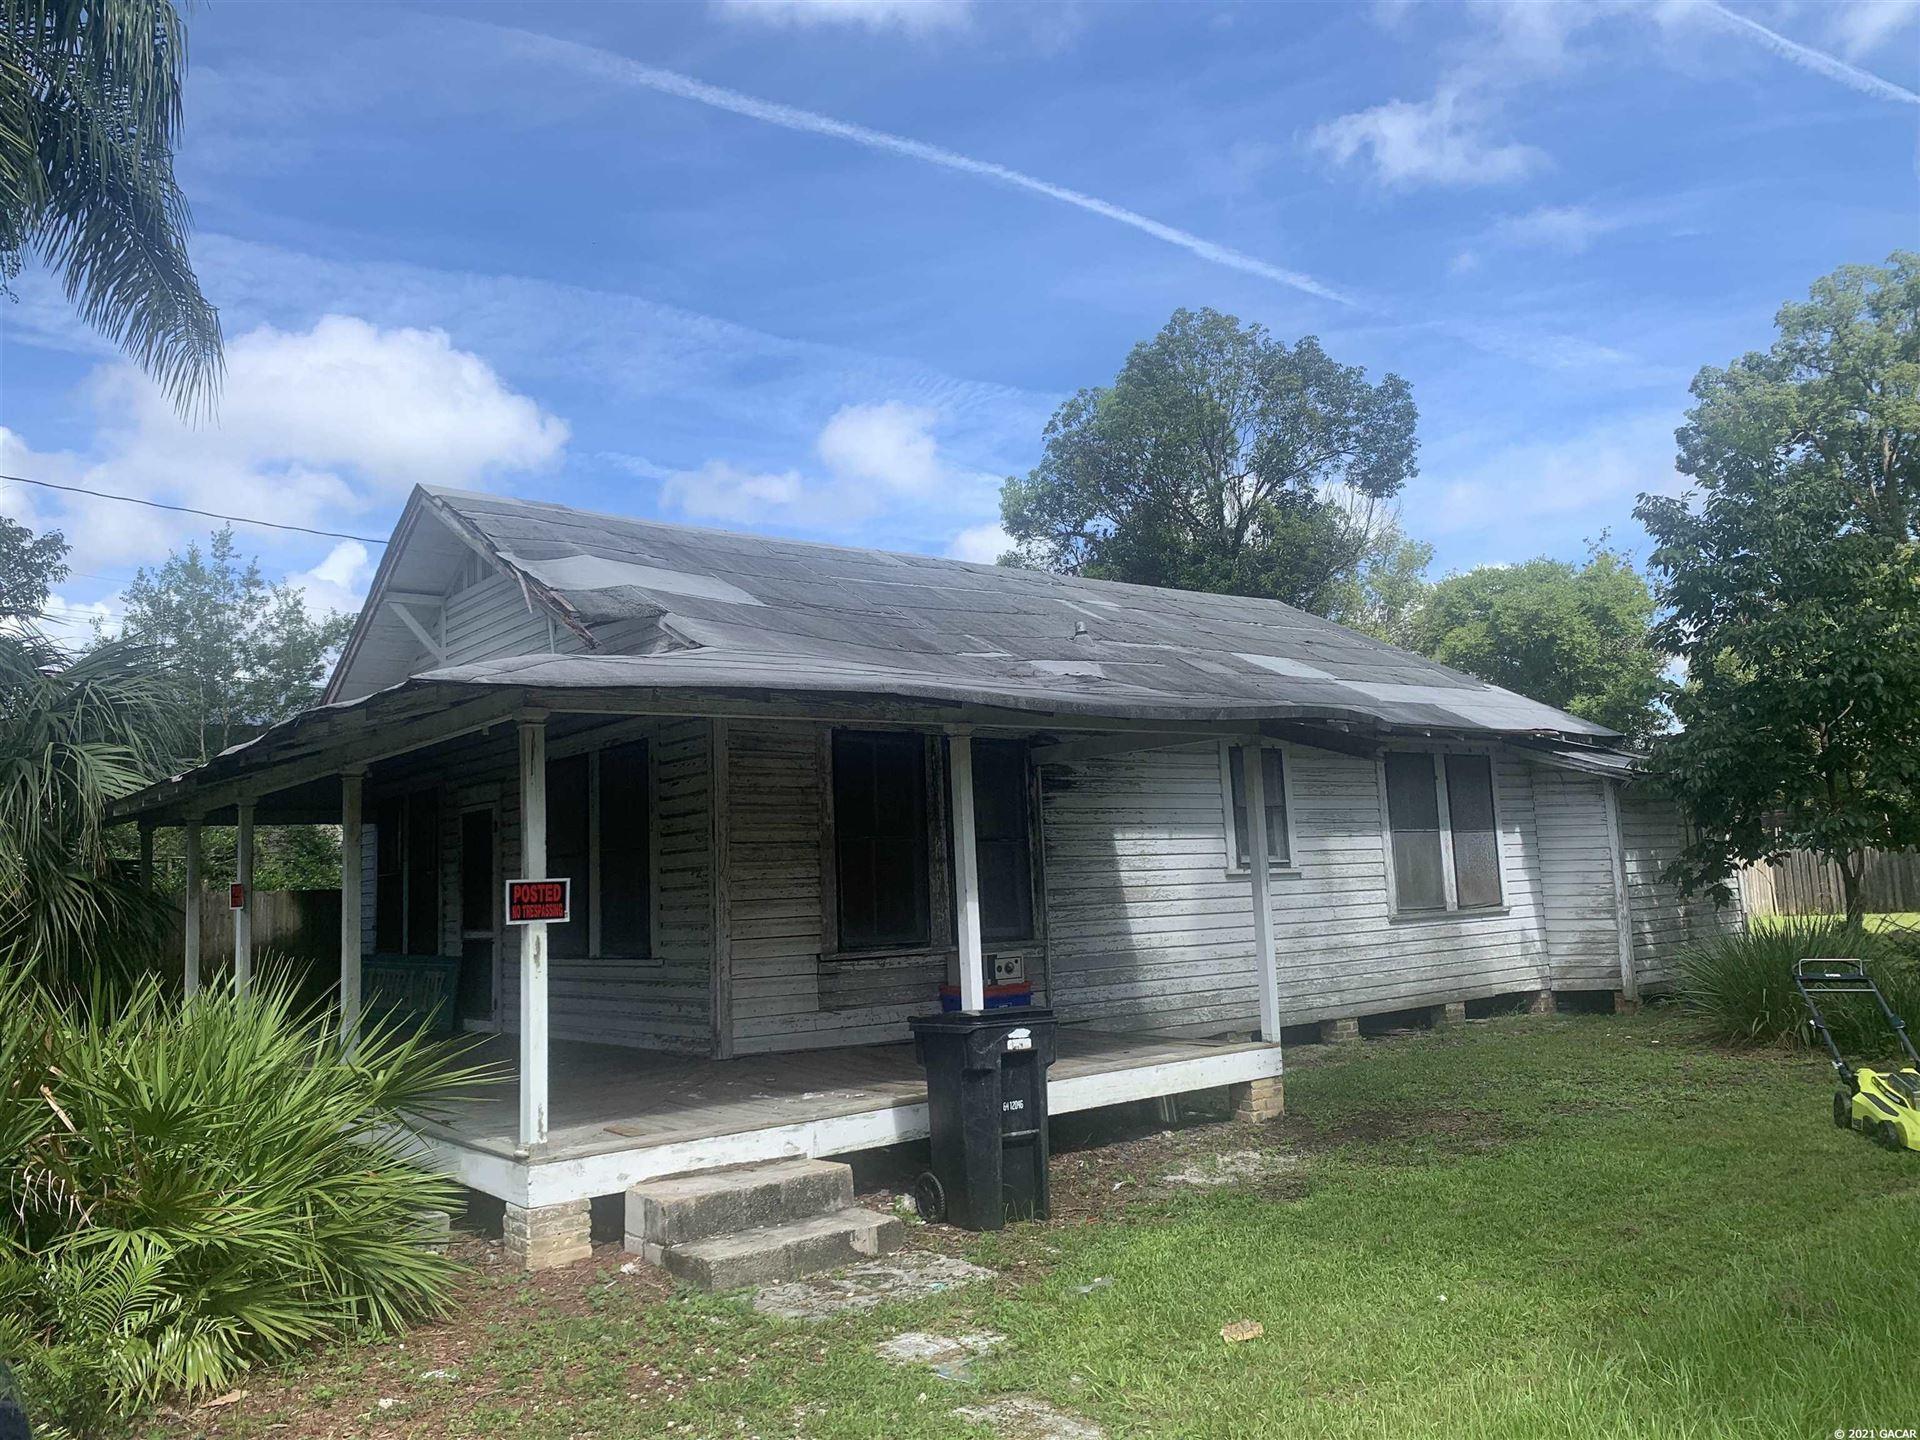 532 NW 29th Avenue, Gainesville, FL 32609-000 - #: 447382